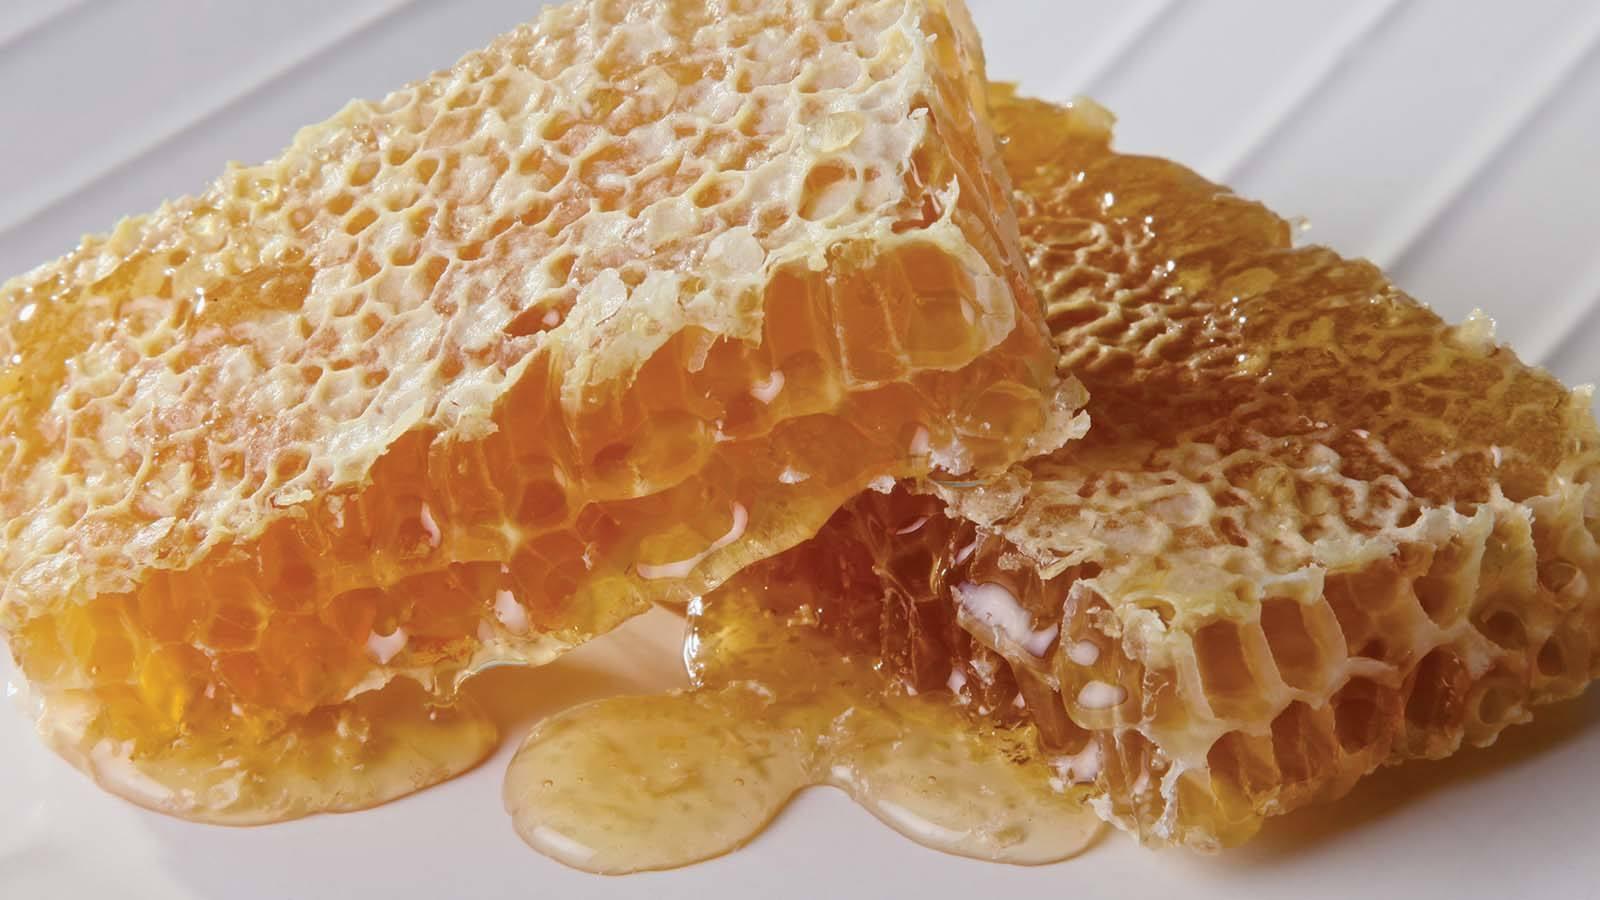 Pure Peninsula Honey, Mornington Peninsula, Victoria, Australia